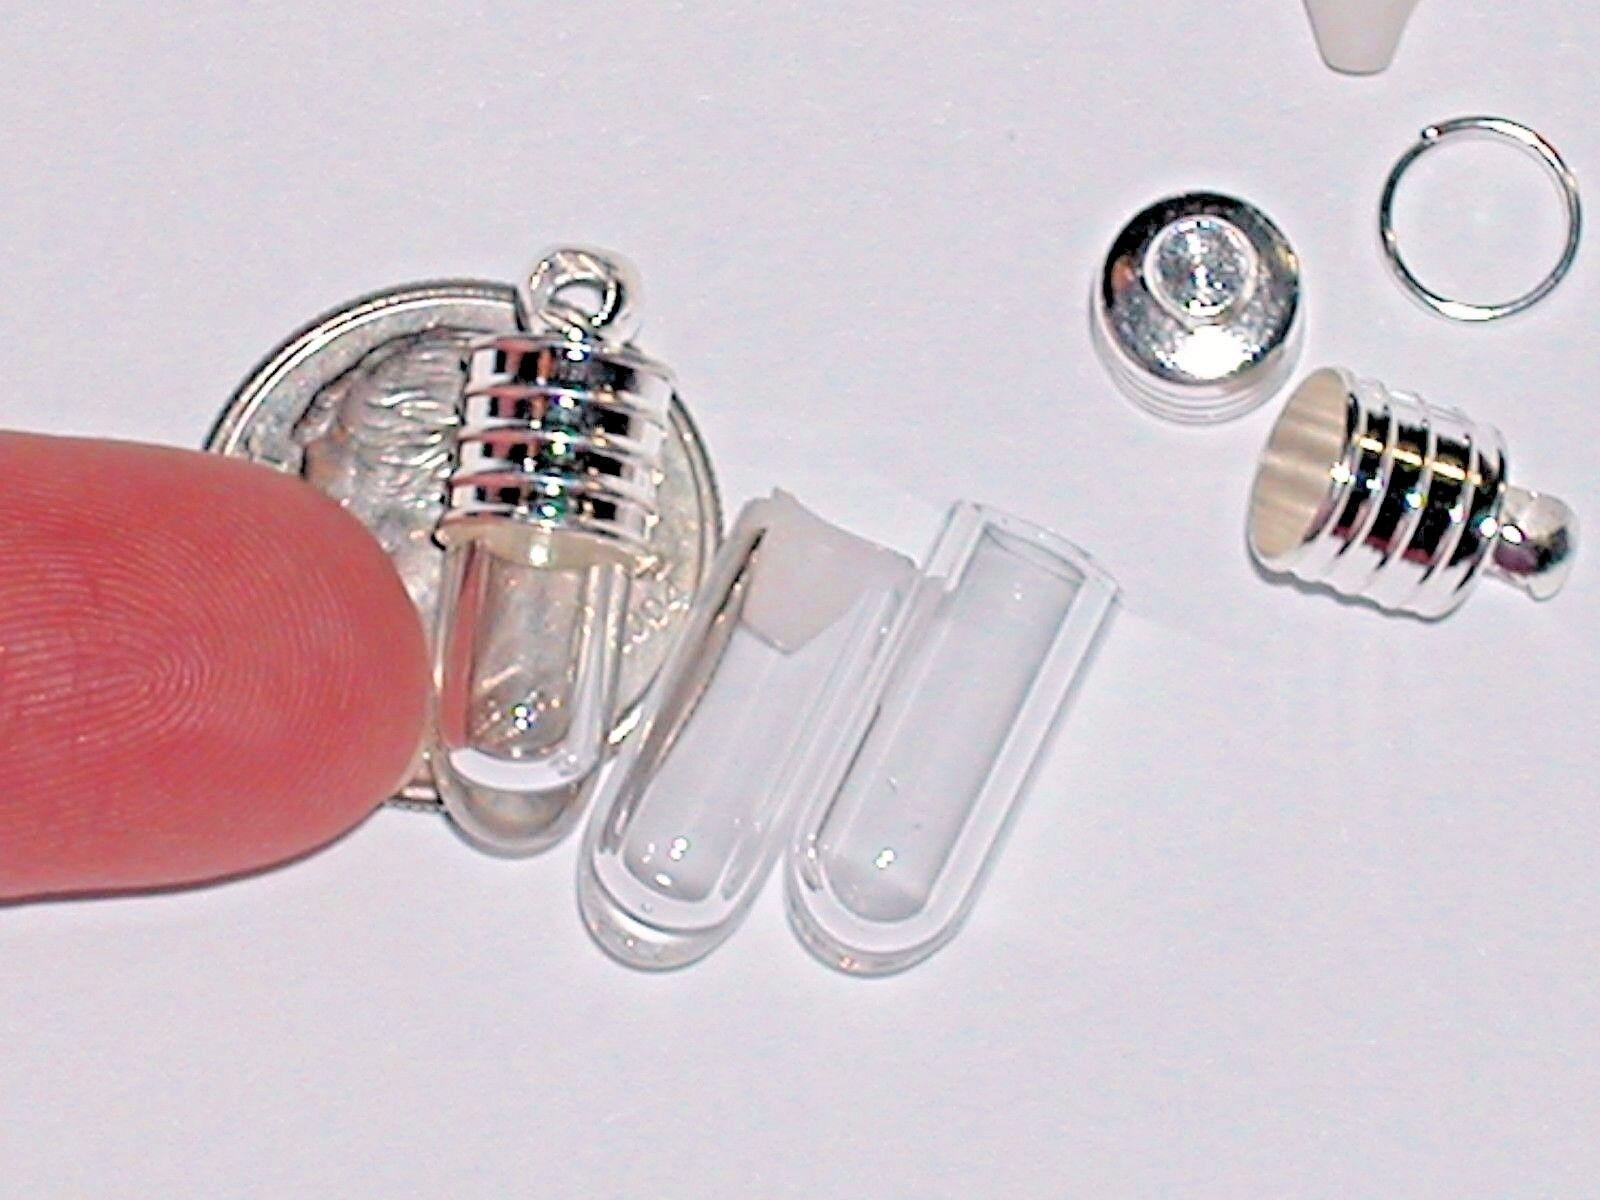 1 Tiniest Short Mini Tube Glass Bottle Vials Rice Tiny Charm Little Pendant Cap  - $4.40